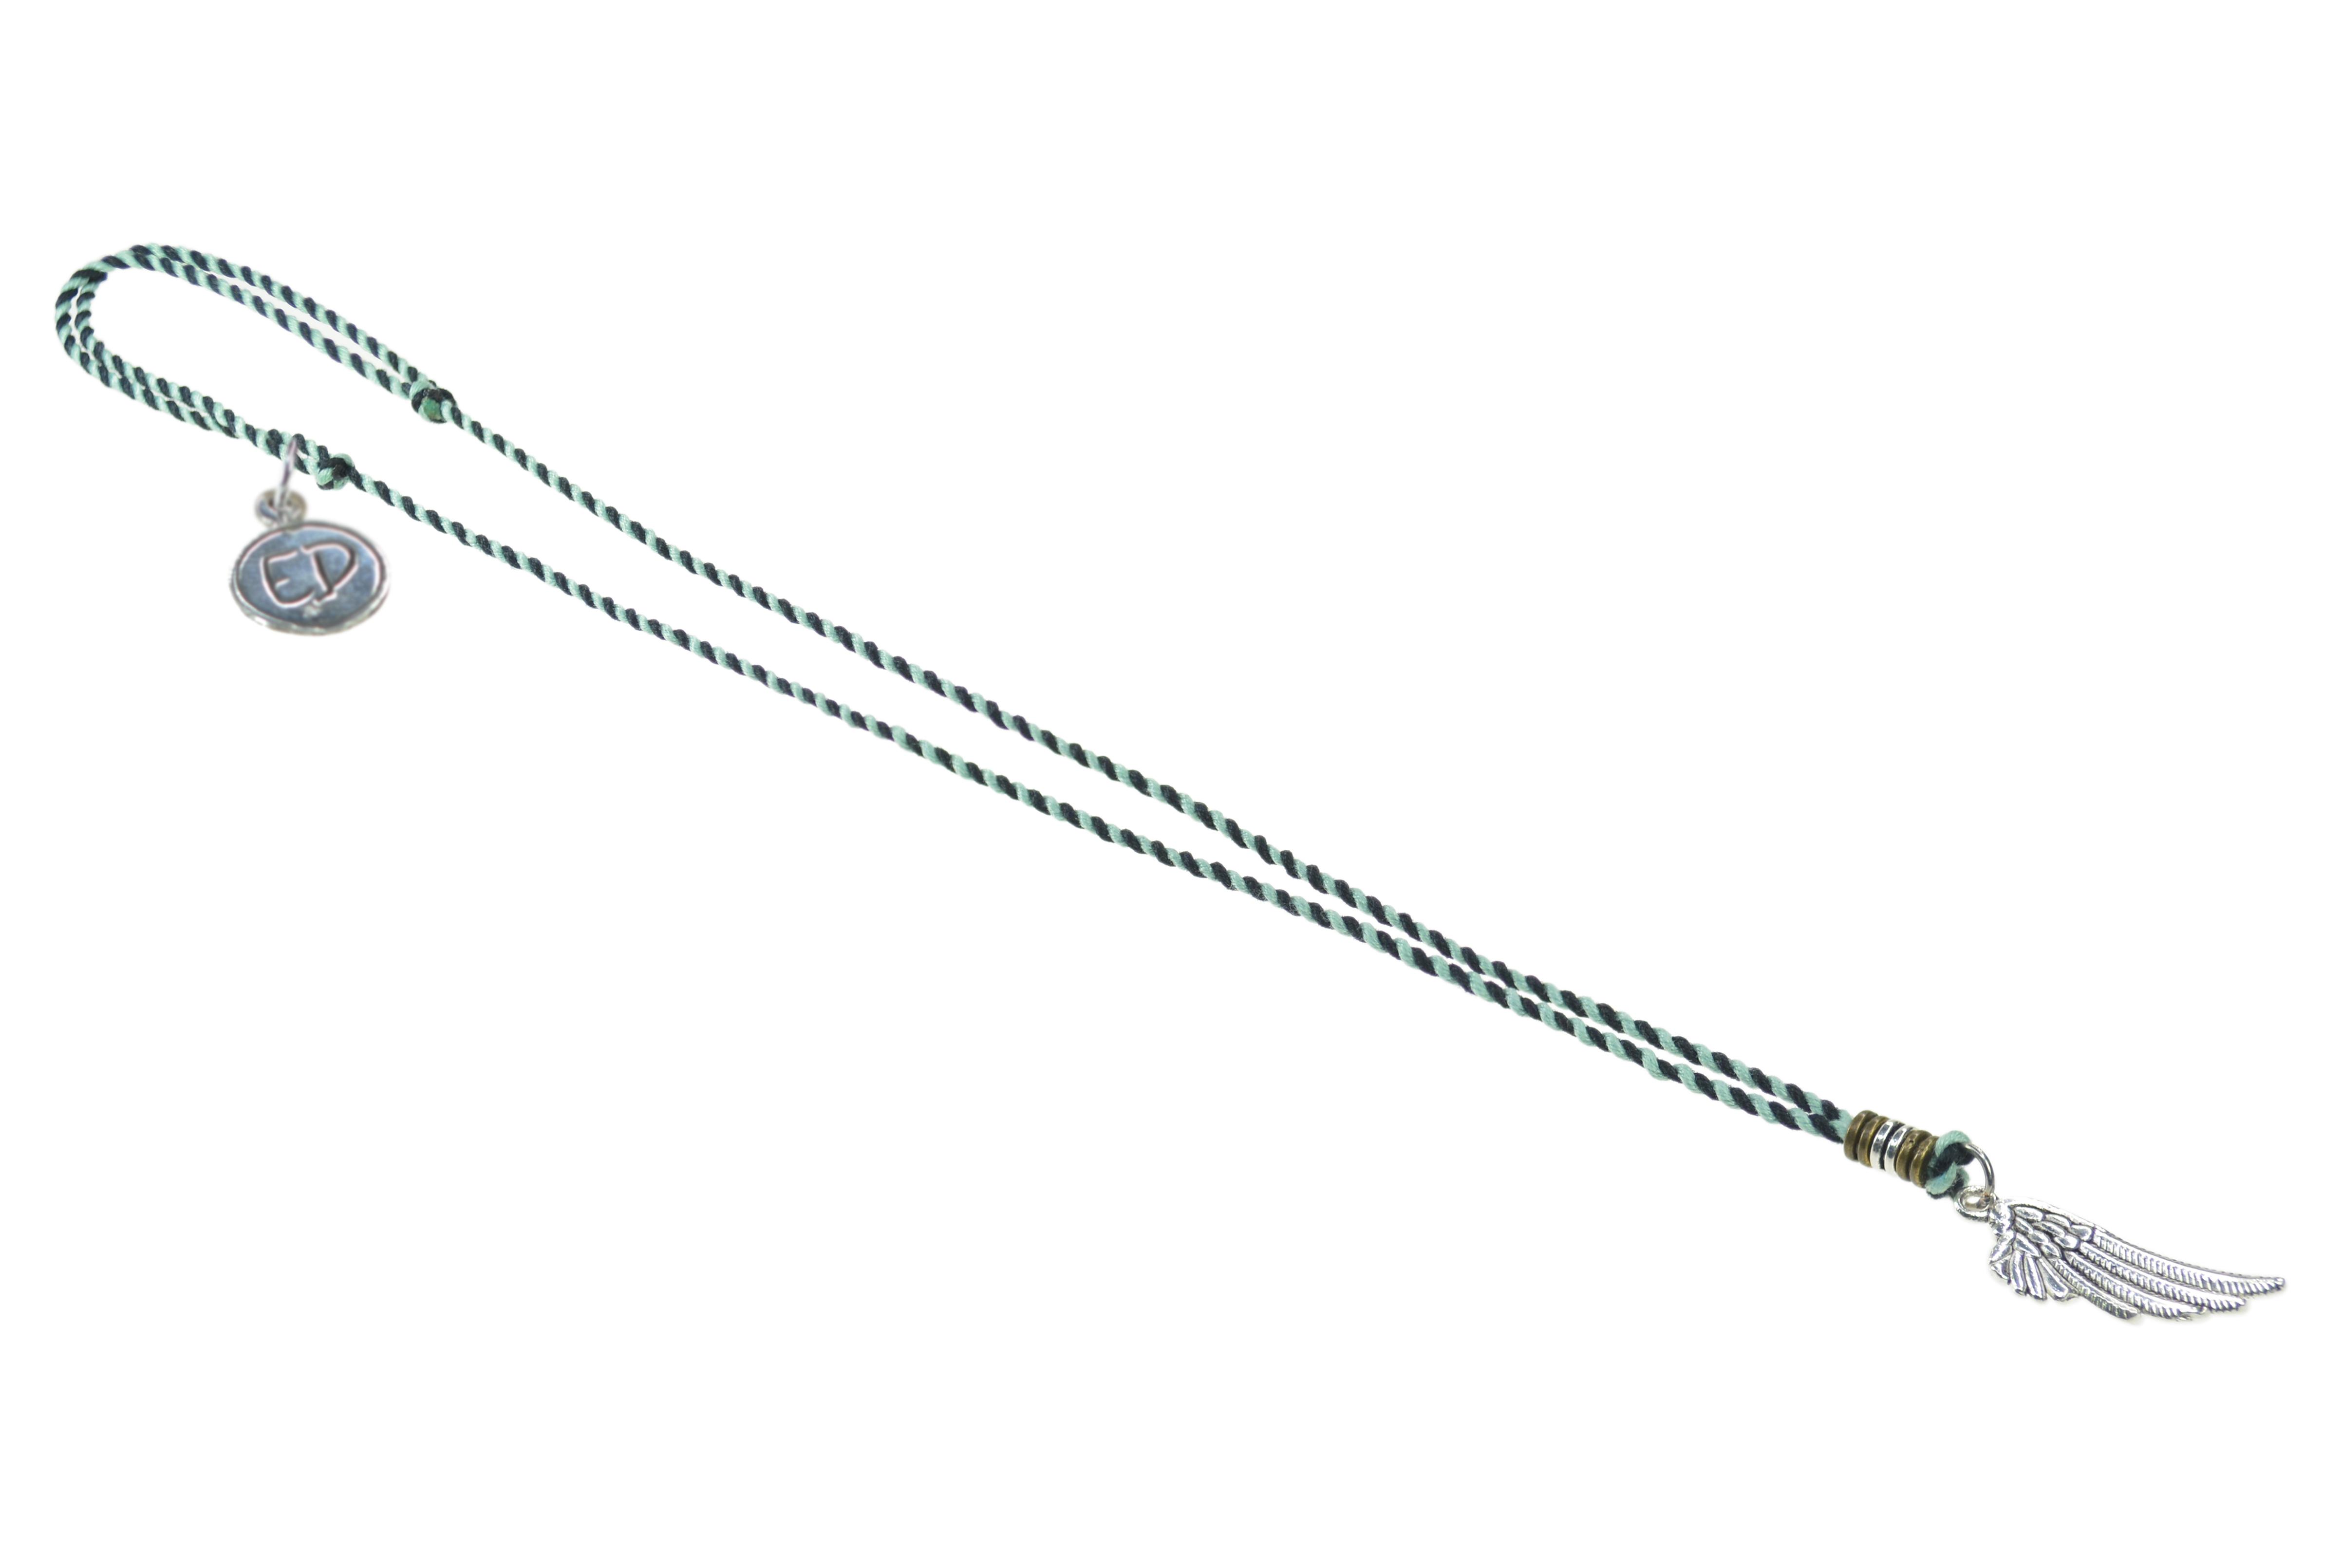 Pánsky prírodný náhrdelník s príveskom anjelské krídlo - zelený